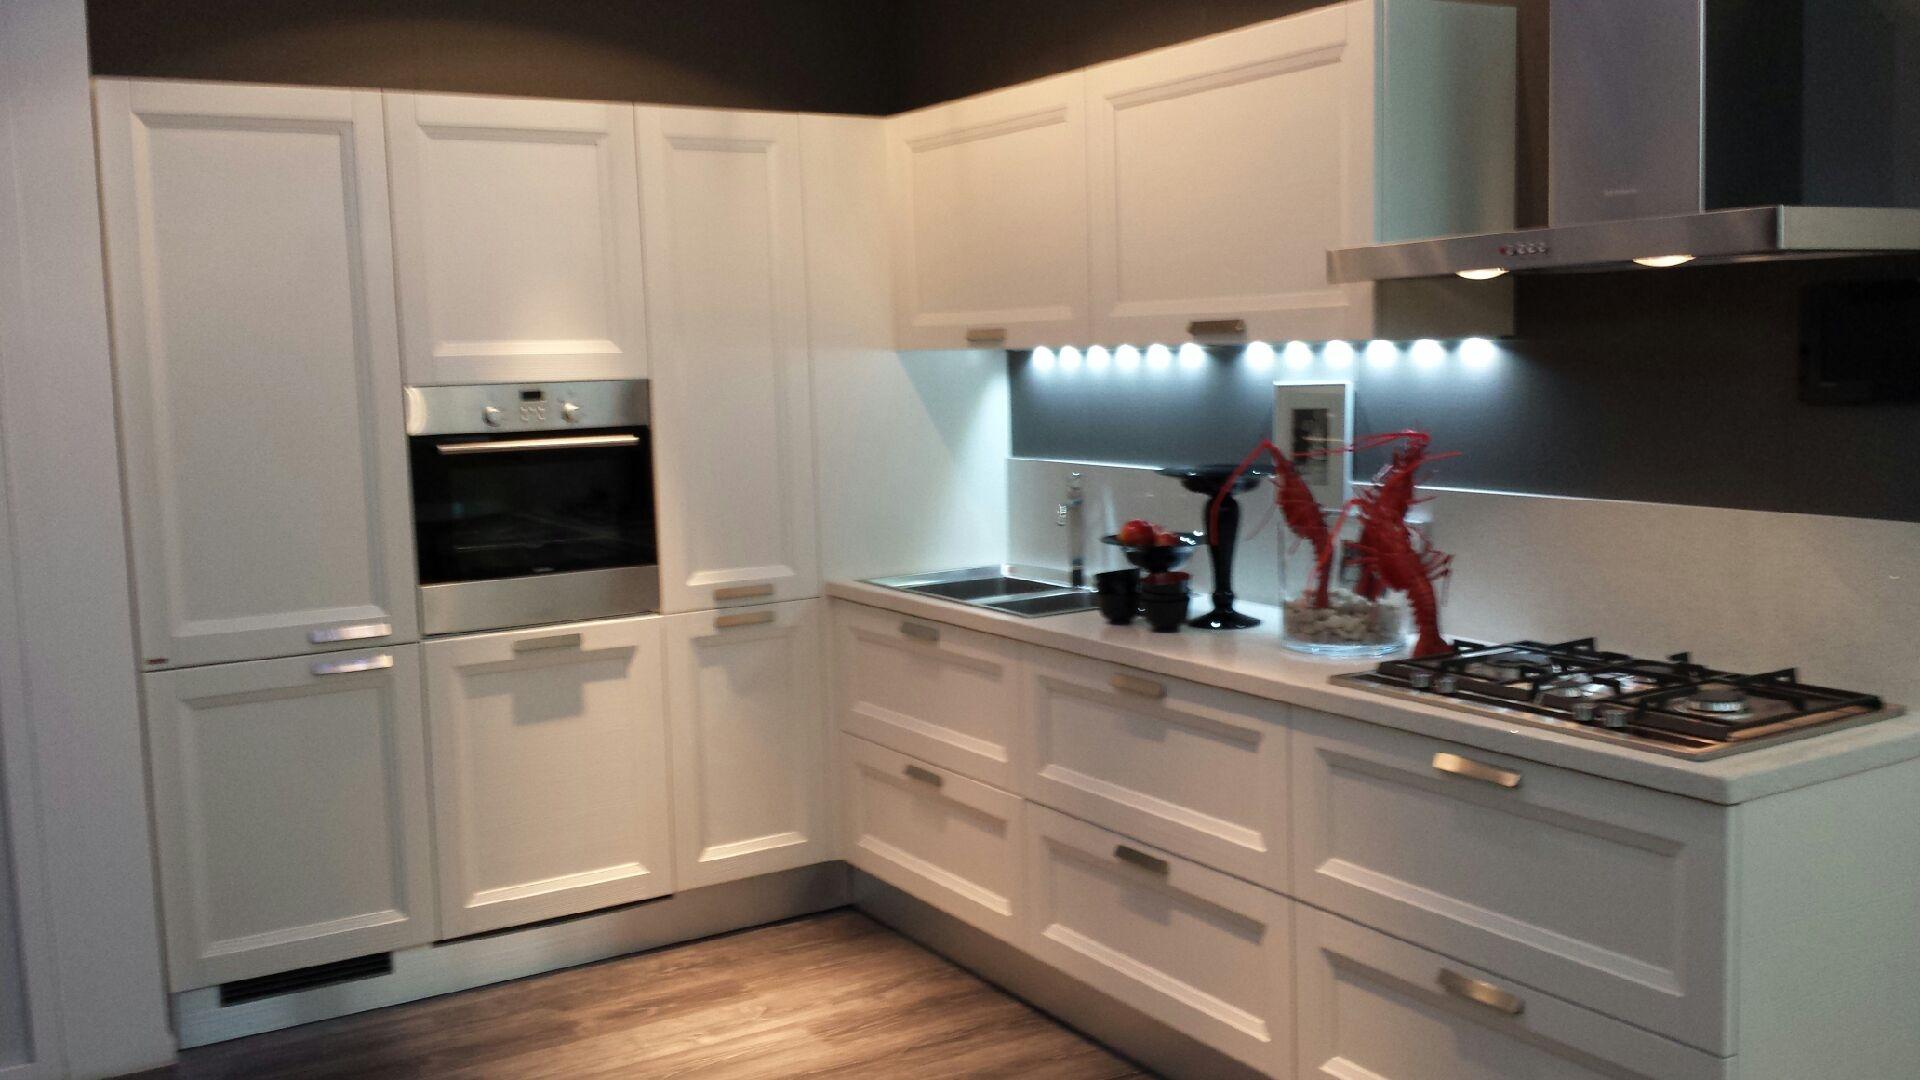 Cucina scavolini scavolini esprit classica legno bianca cucine a prezzi scontati - Cucina classica contemporanea ...